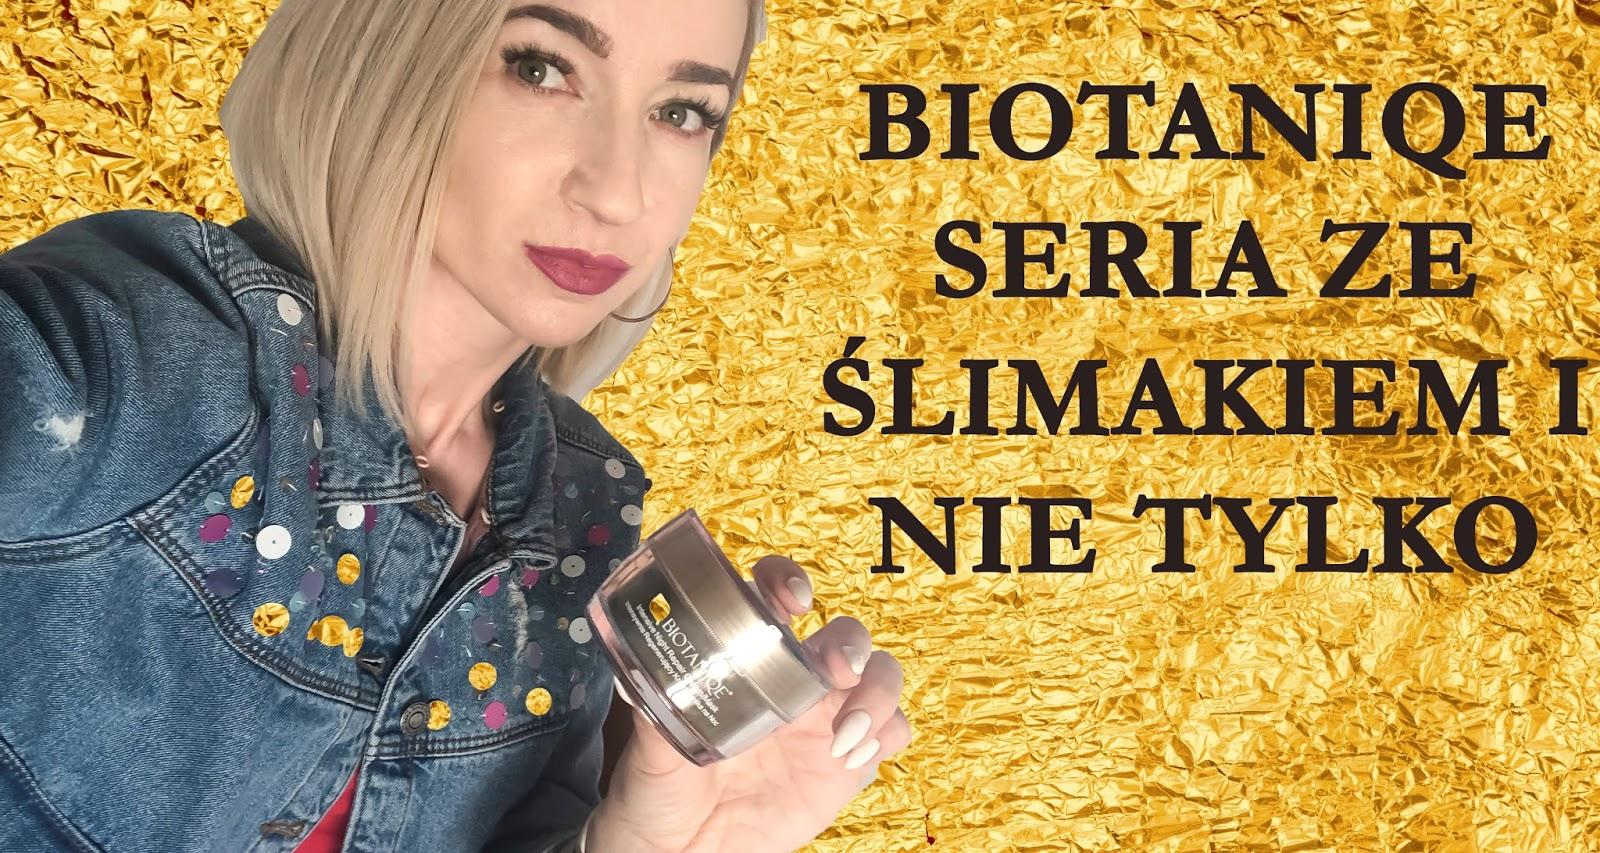 Moja opinia Biotanique krem, serum, maska. Co myślę o ślimaku w kremie?